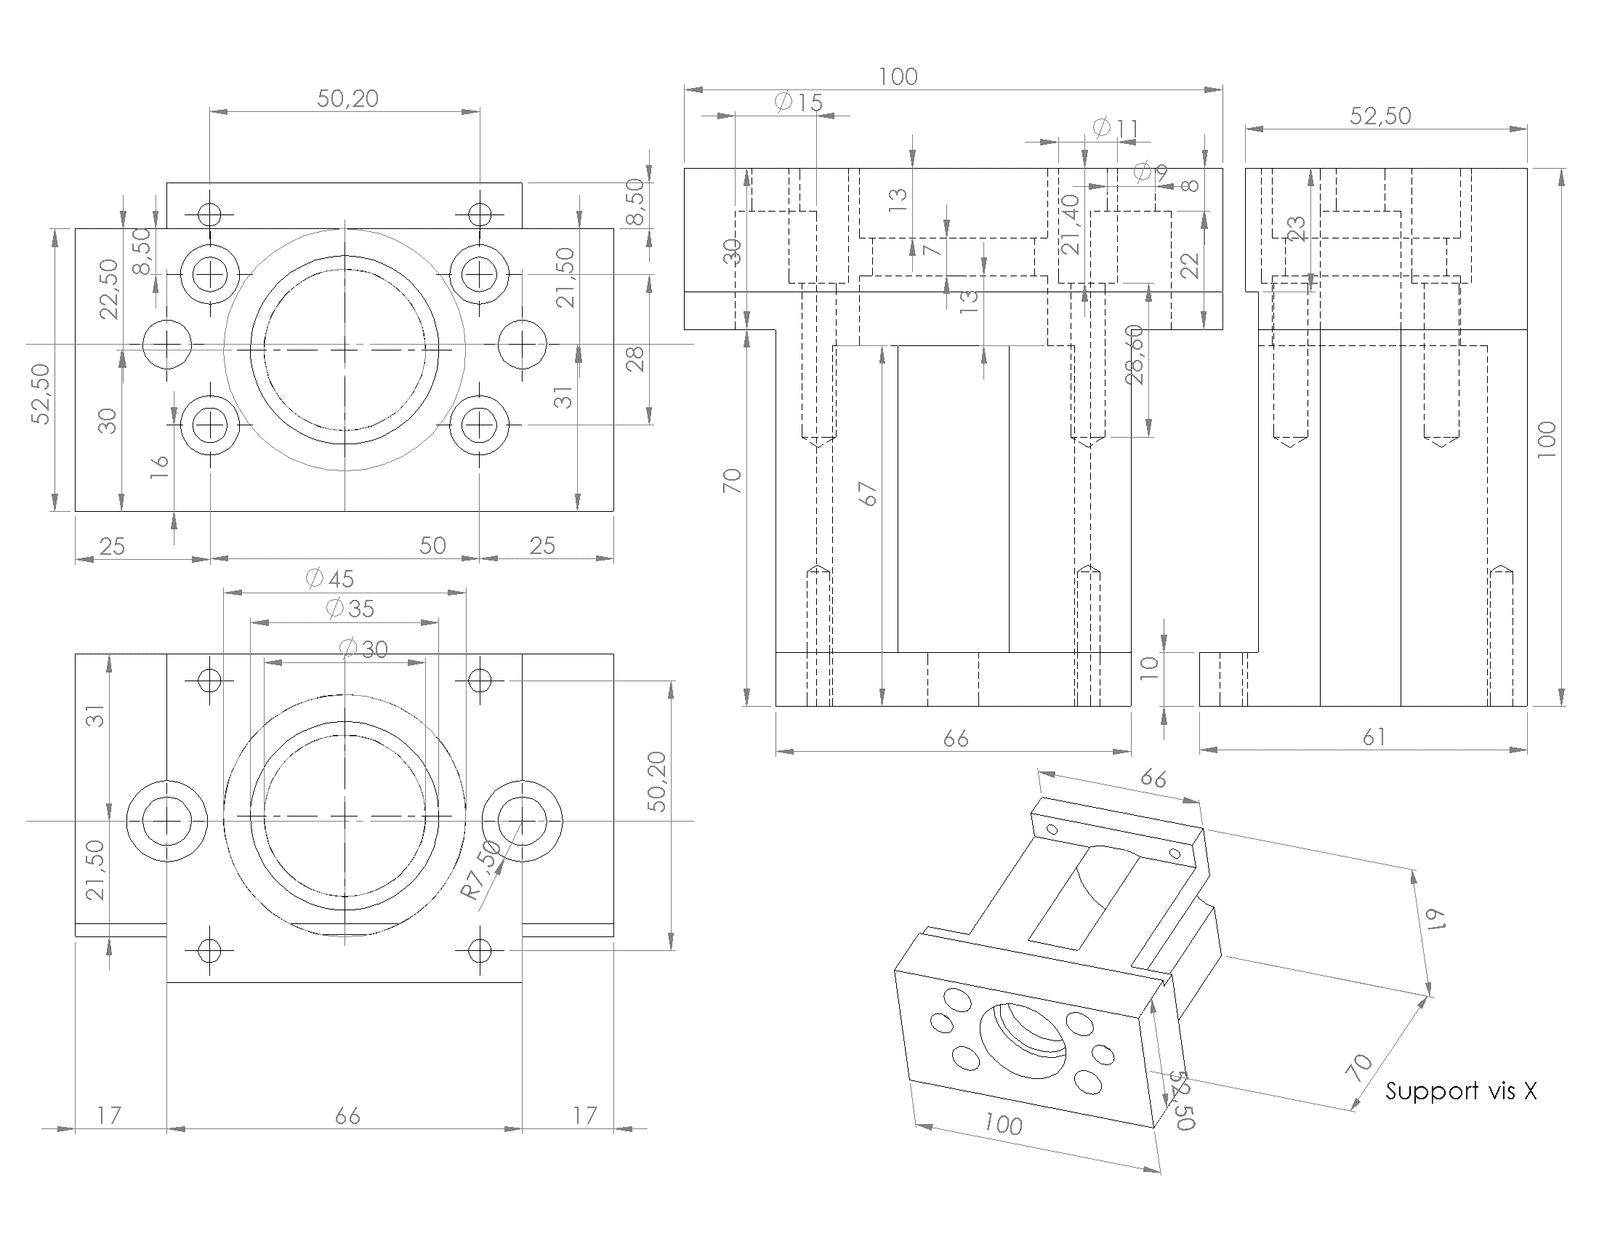 support moteur vis X.PNG